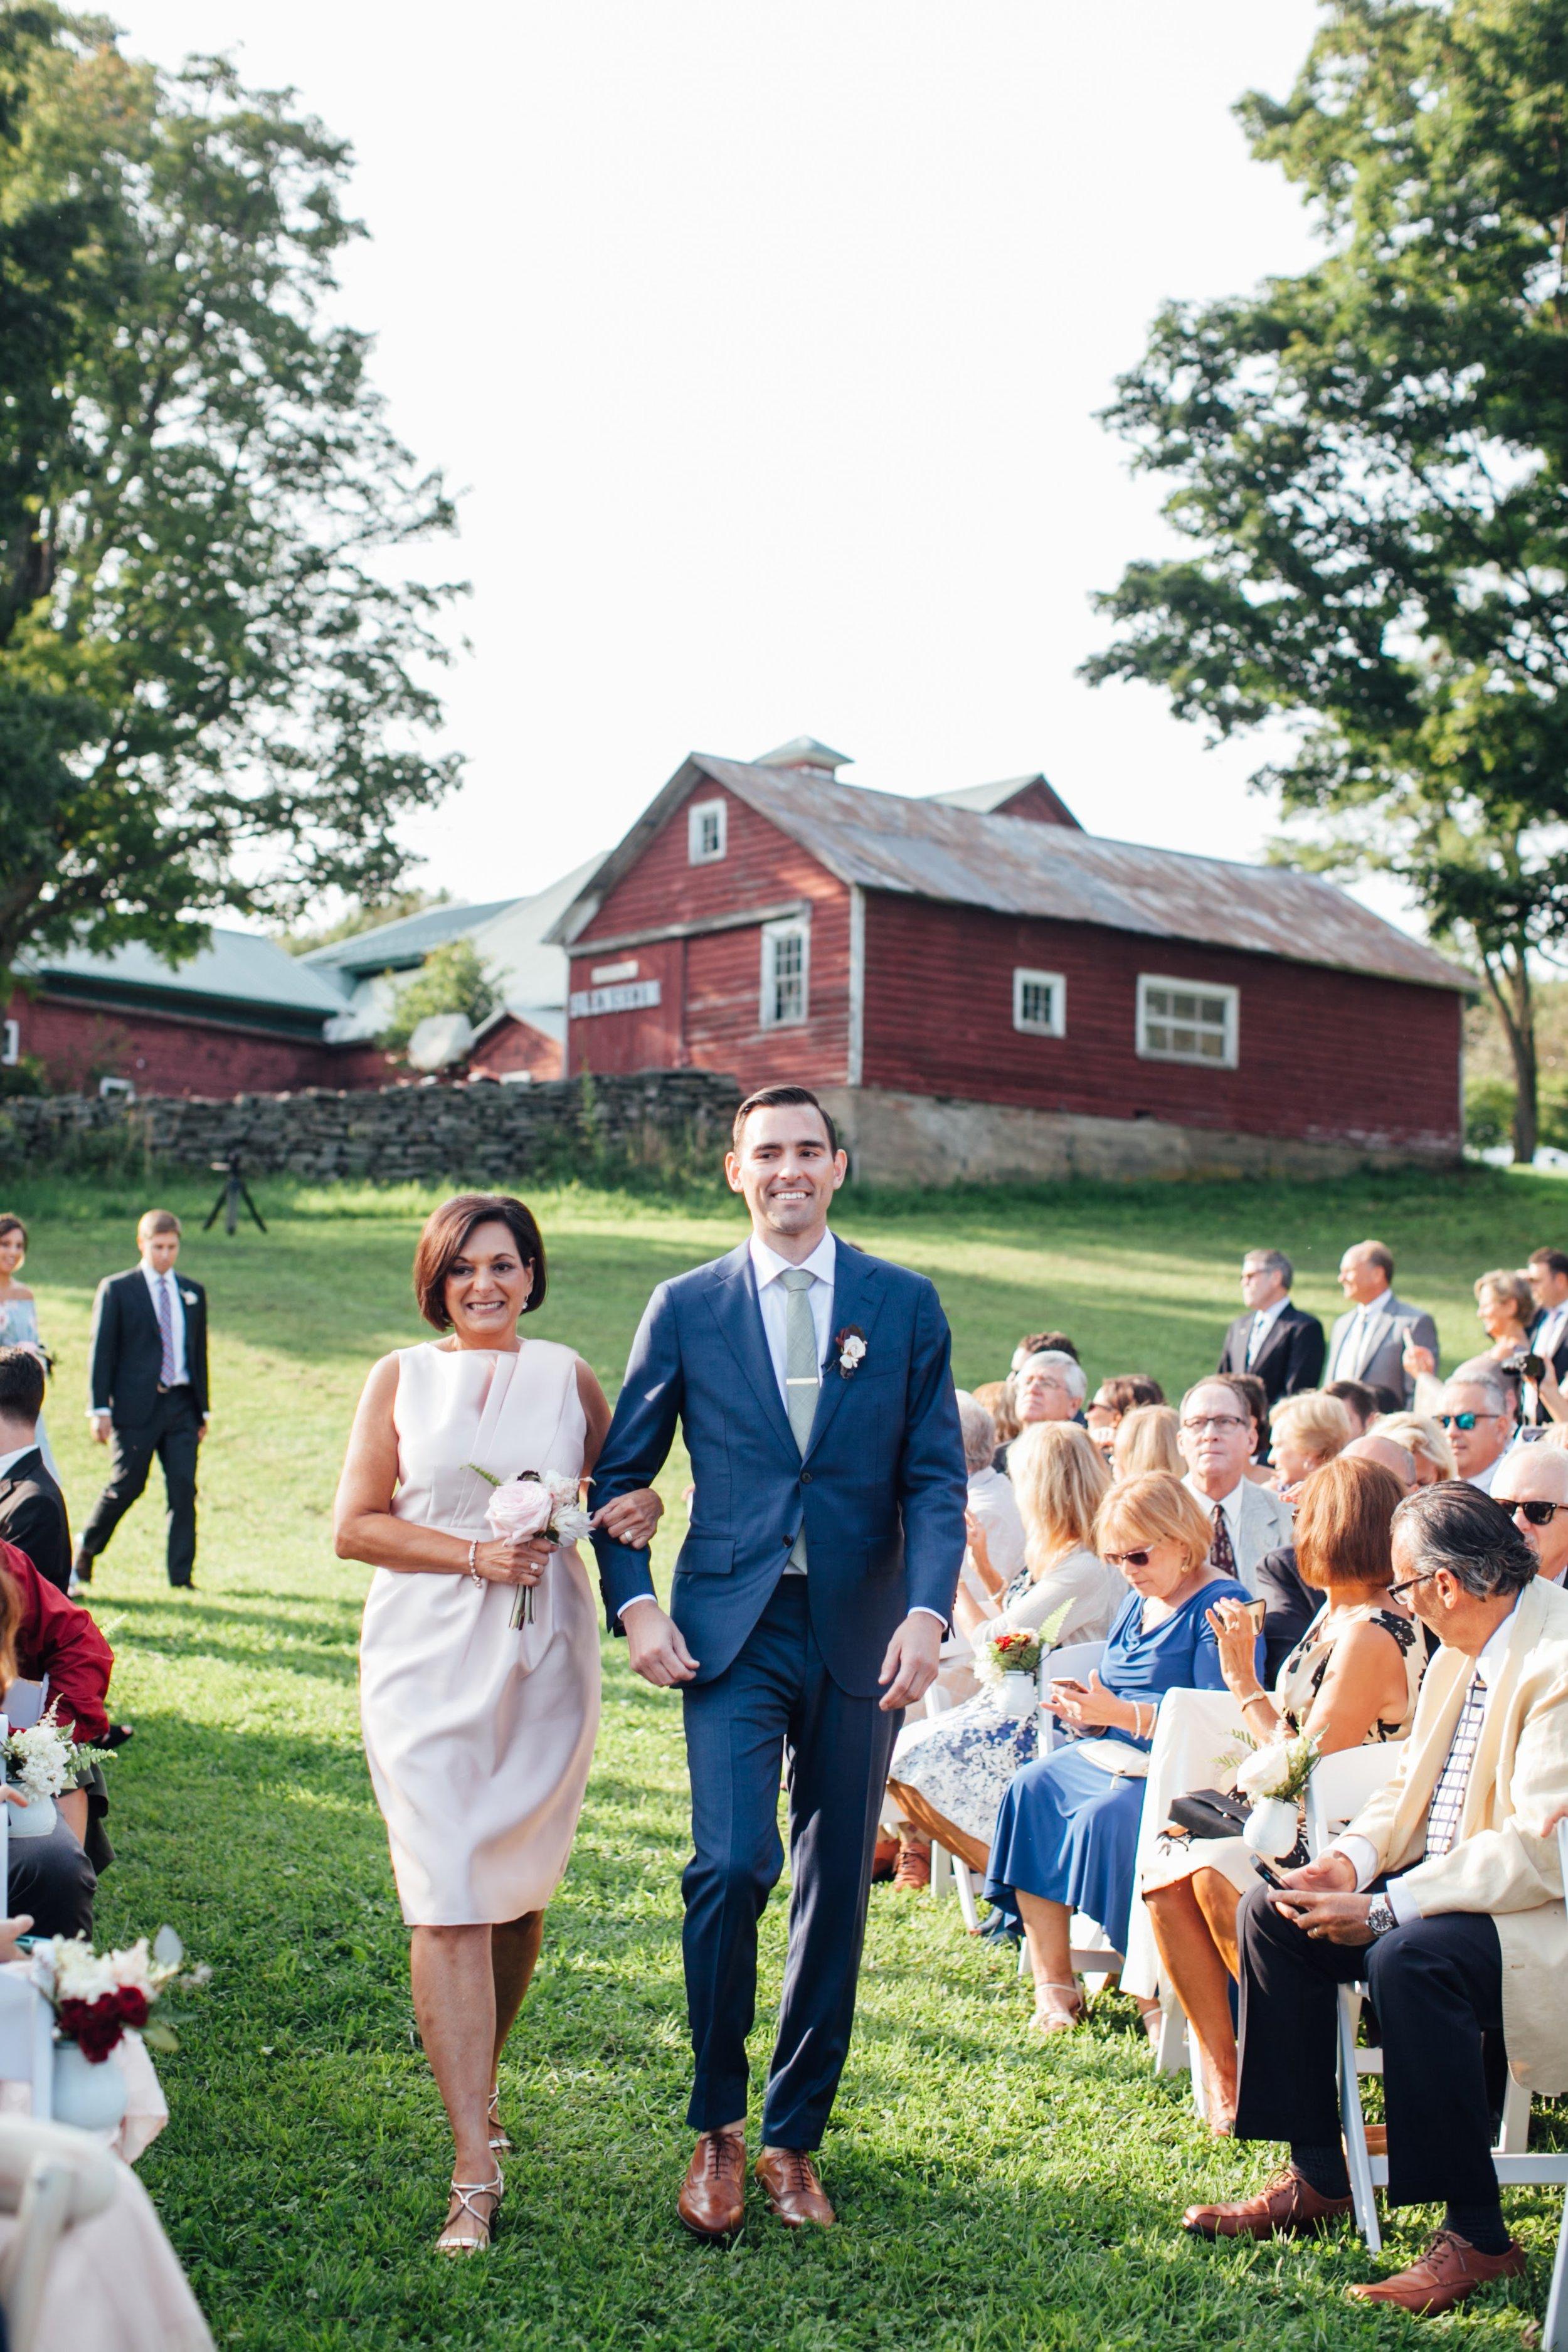 Courtney + Matt Blenheim Hill Farm Catskills NY Wedding Veronica Lola Photography 2017-352.jpg